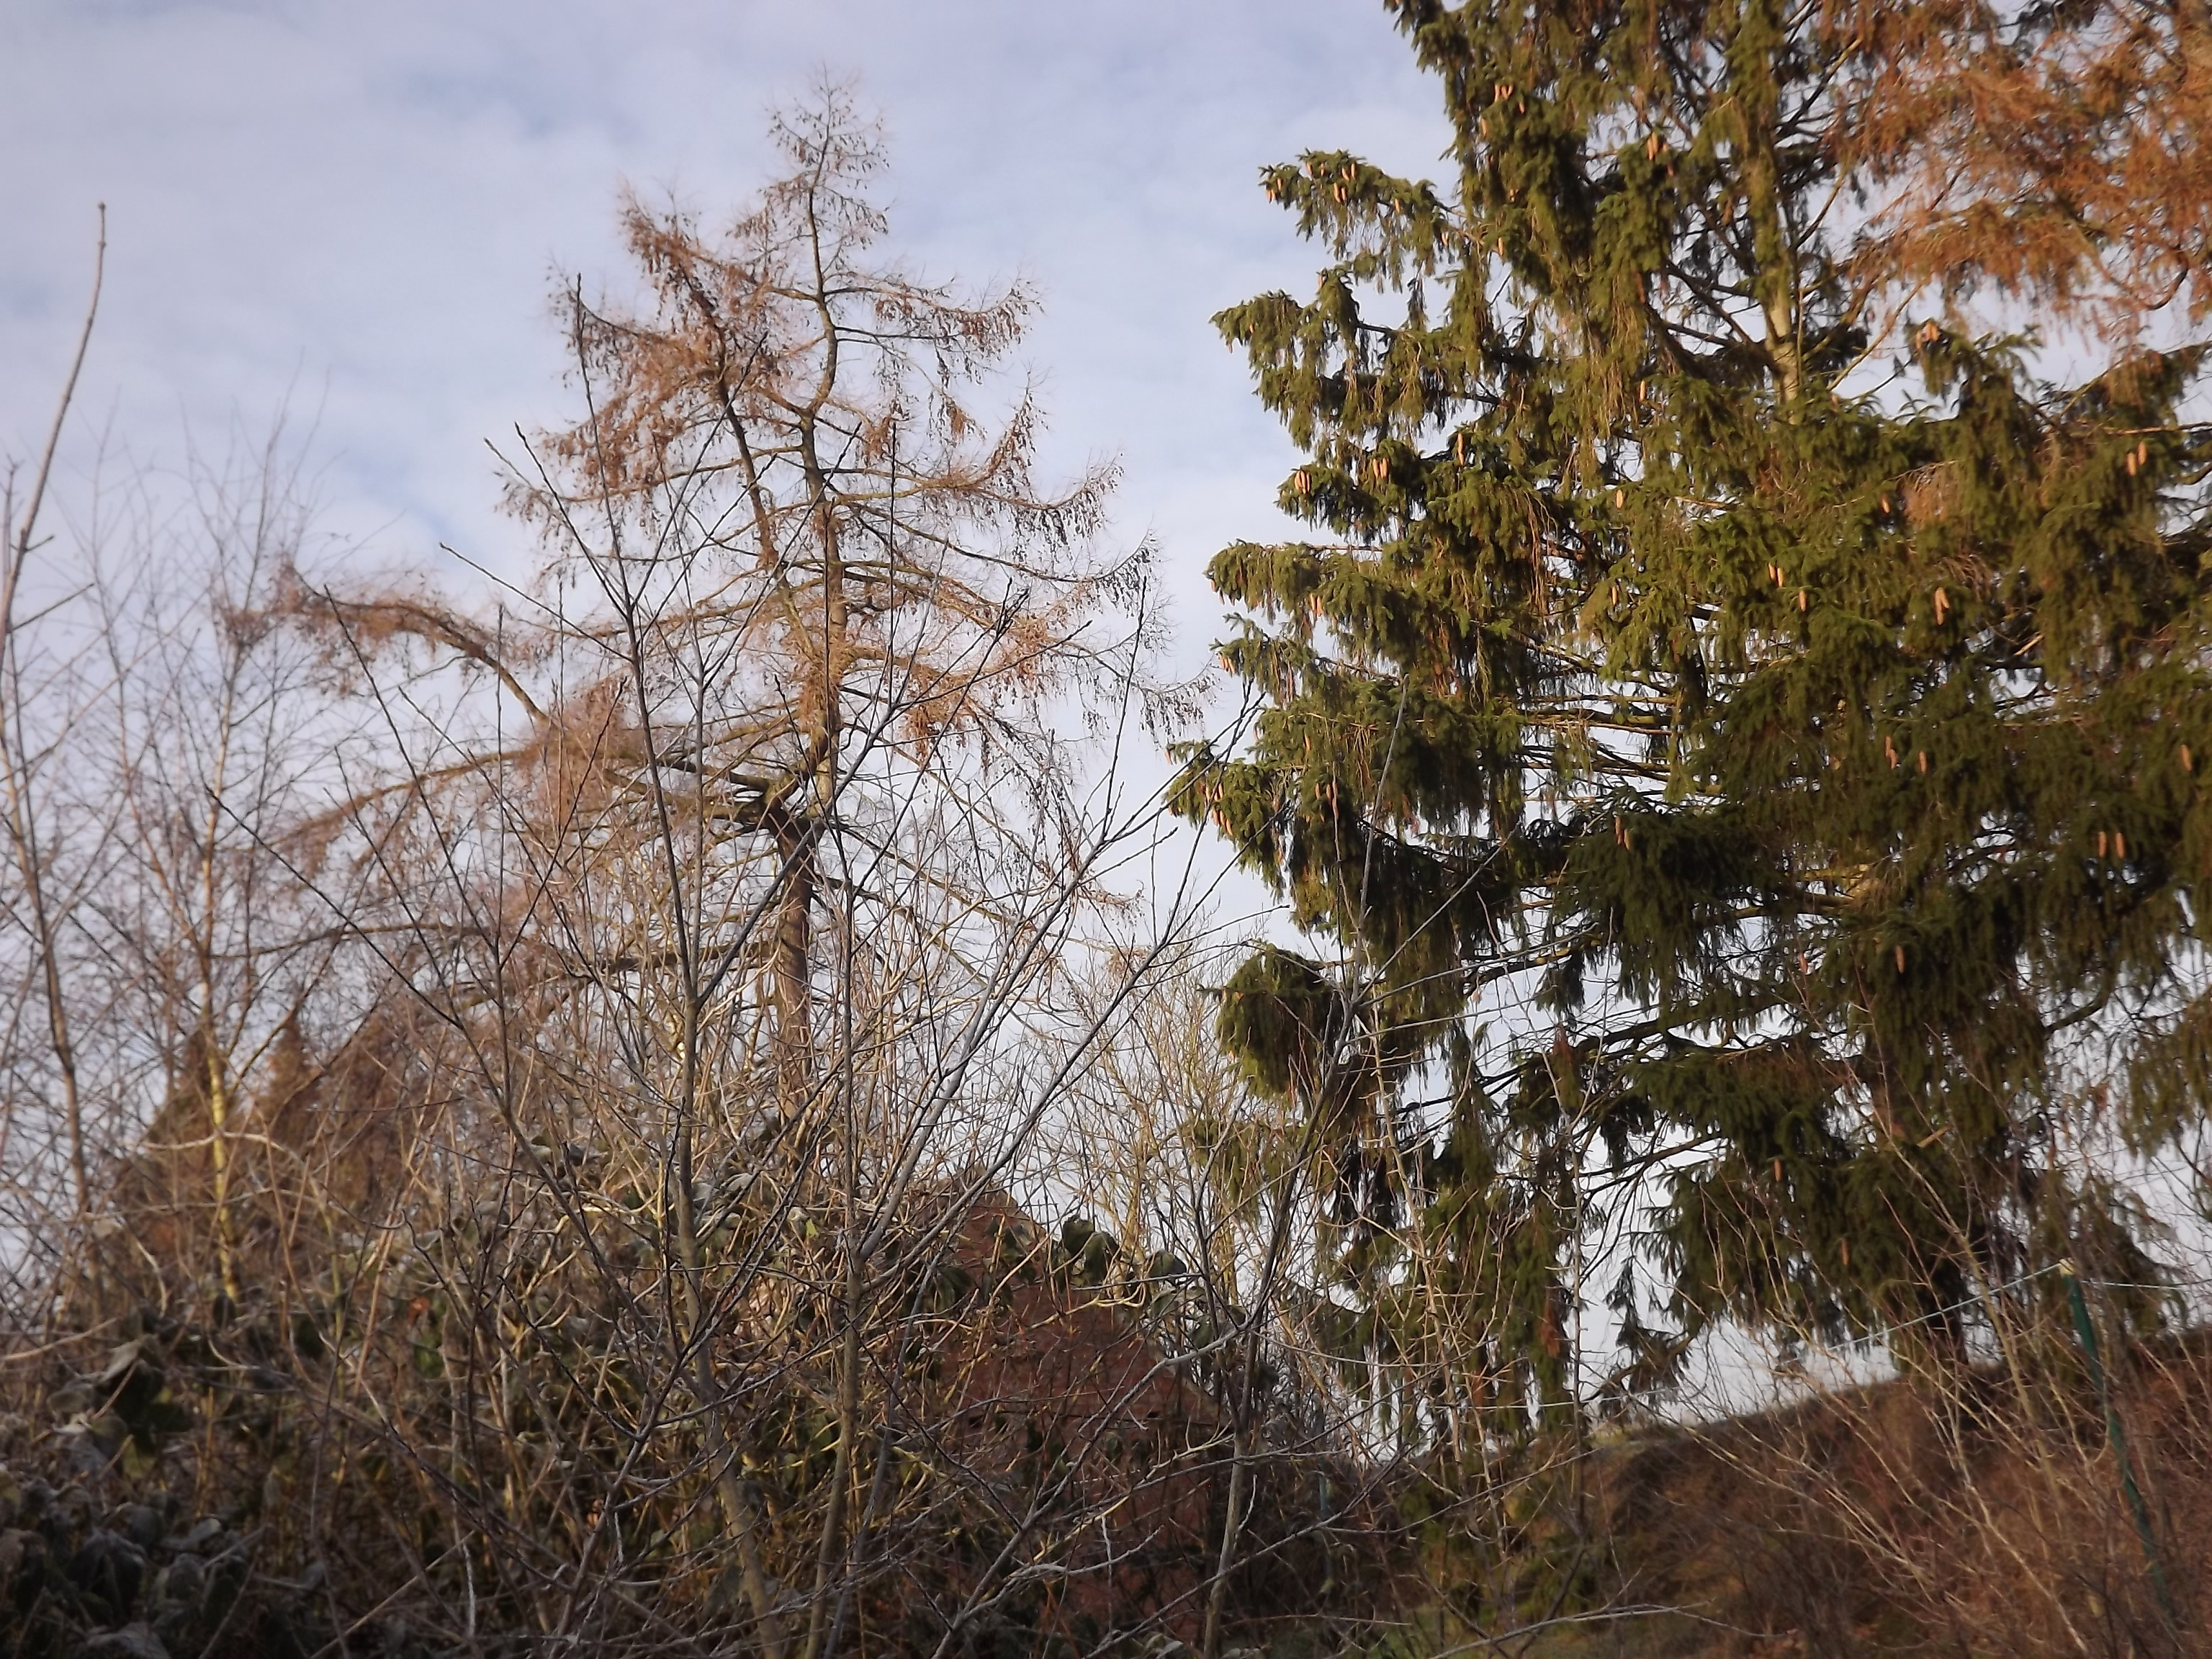 8374-abendsonne-winter-baeume